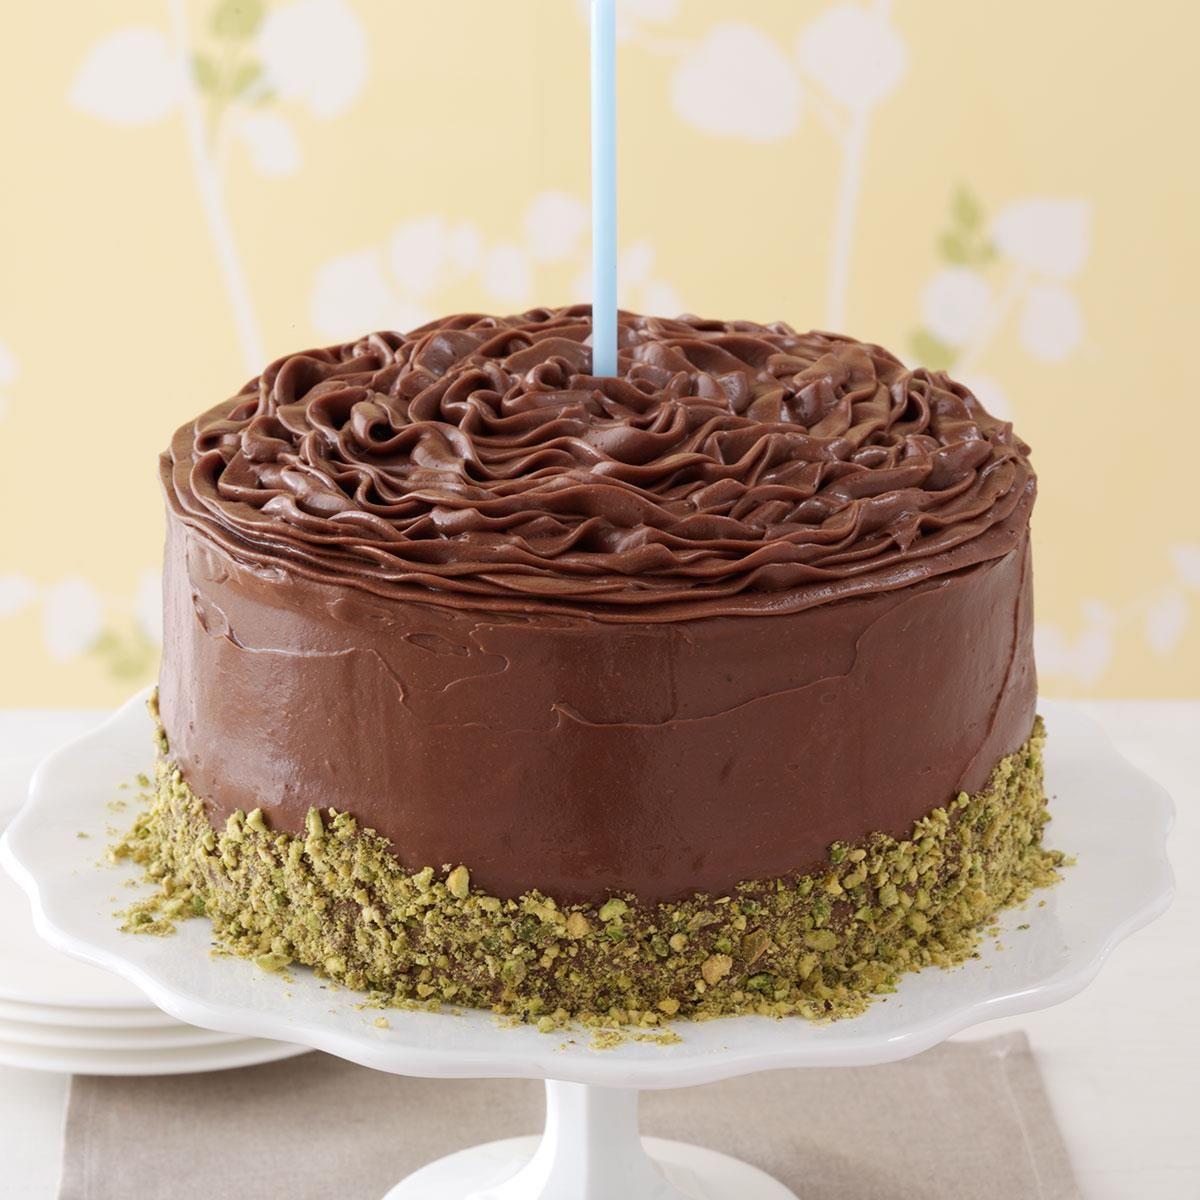 Banana Cake With Chocolate Frosting Receta Como Decorar Una